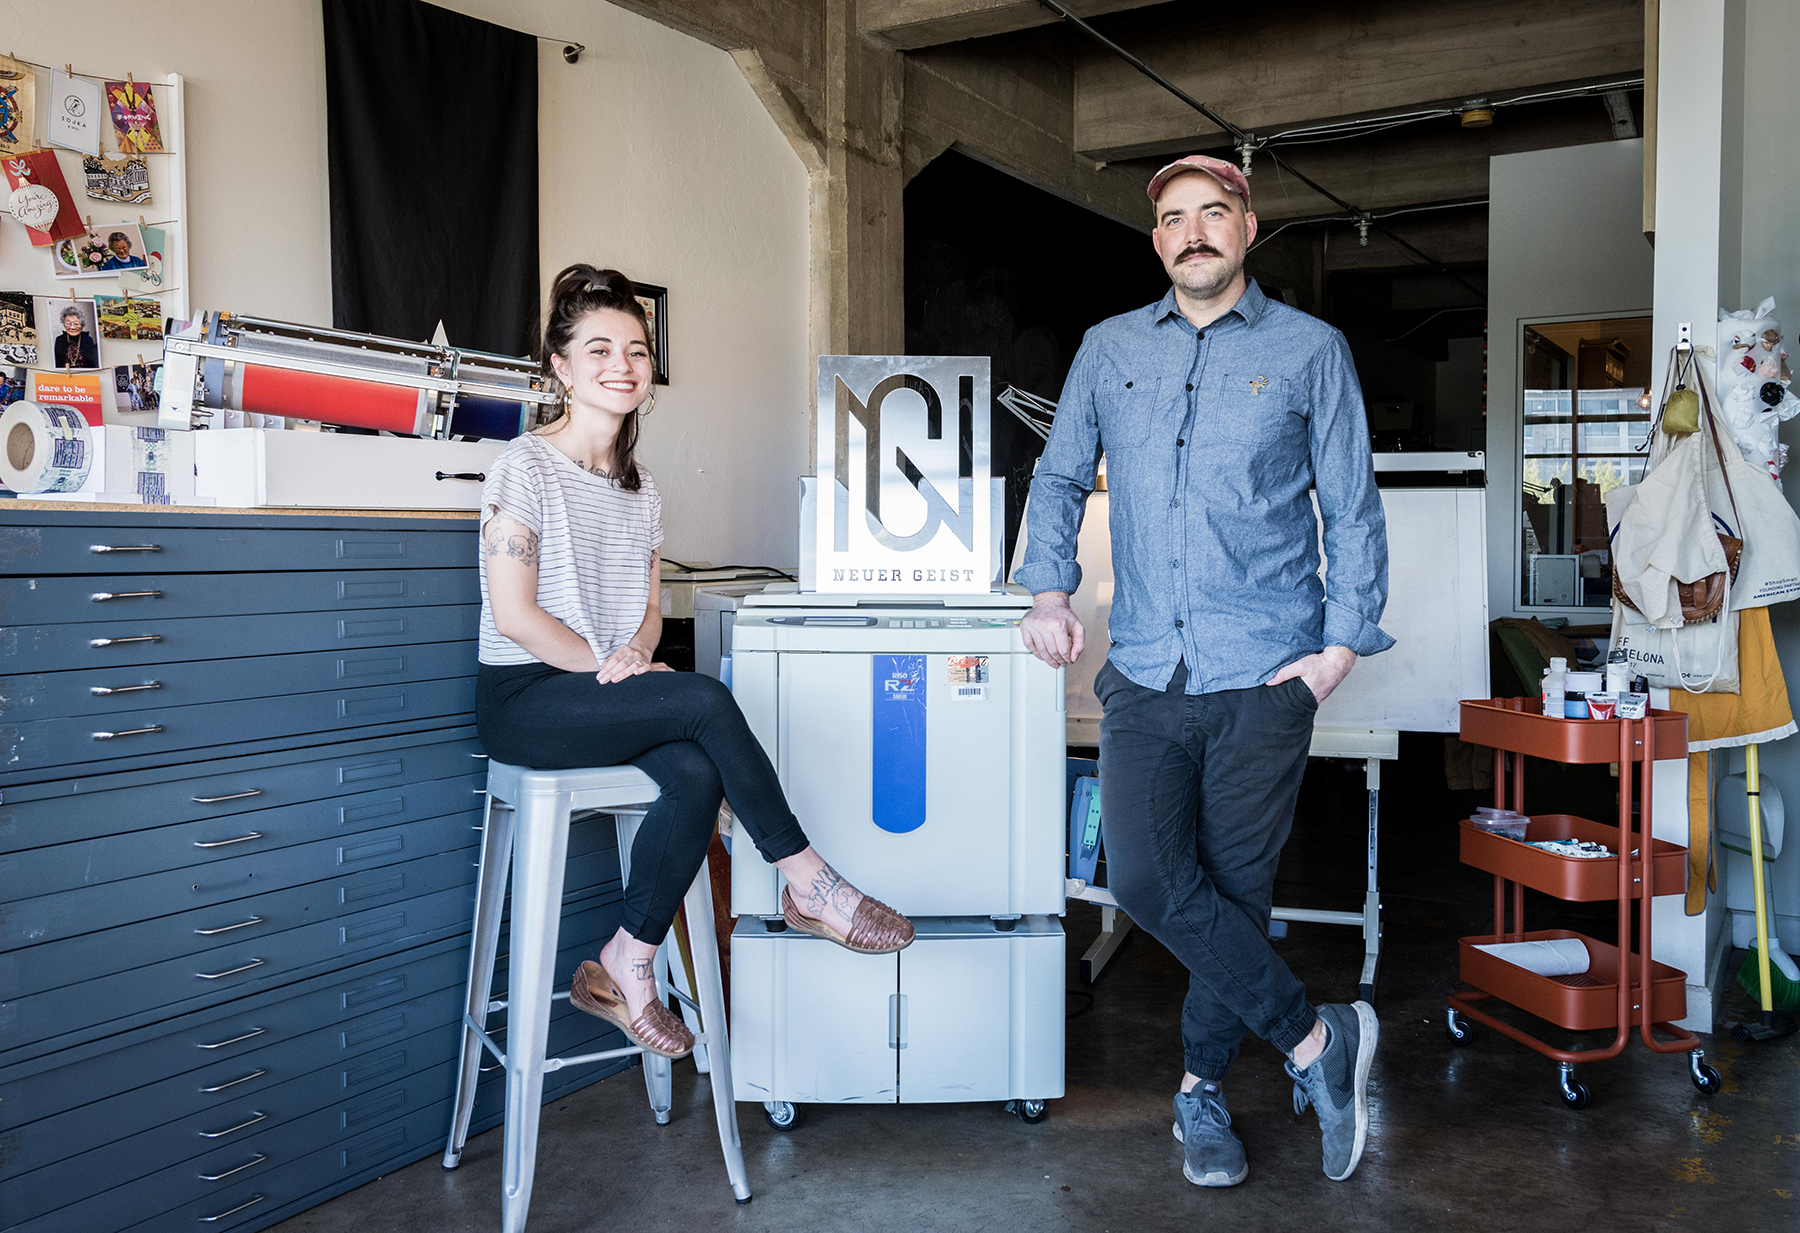 (L–R) Brighton Ballard and Derek Ballard flex their design and branding prowess with their risograph machines.